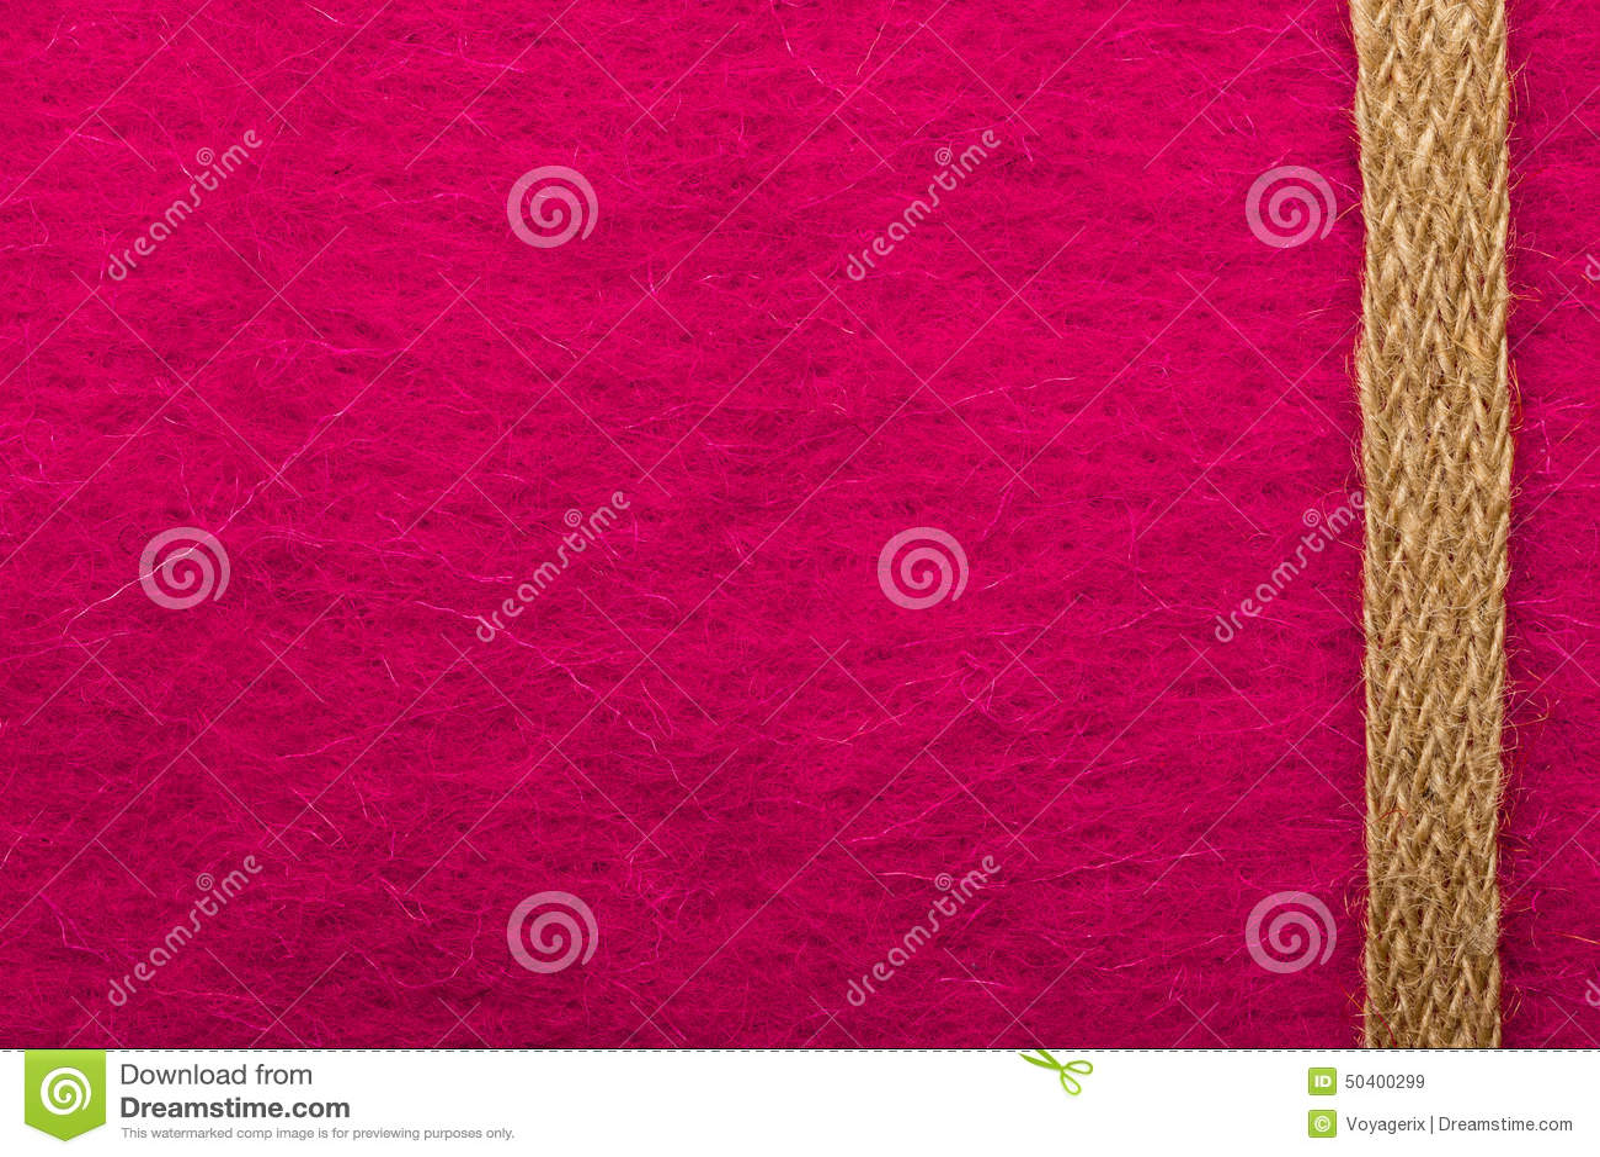 Jutowa arkana nad różowym tłem